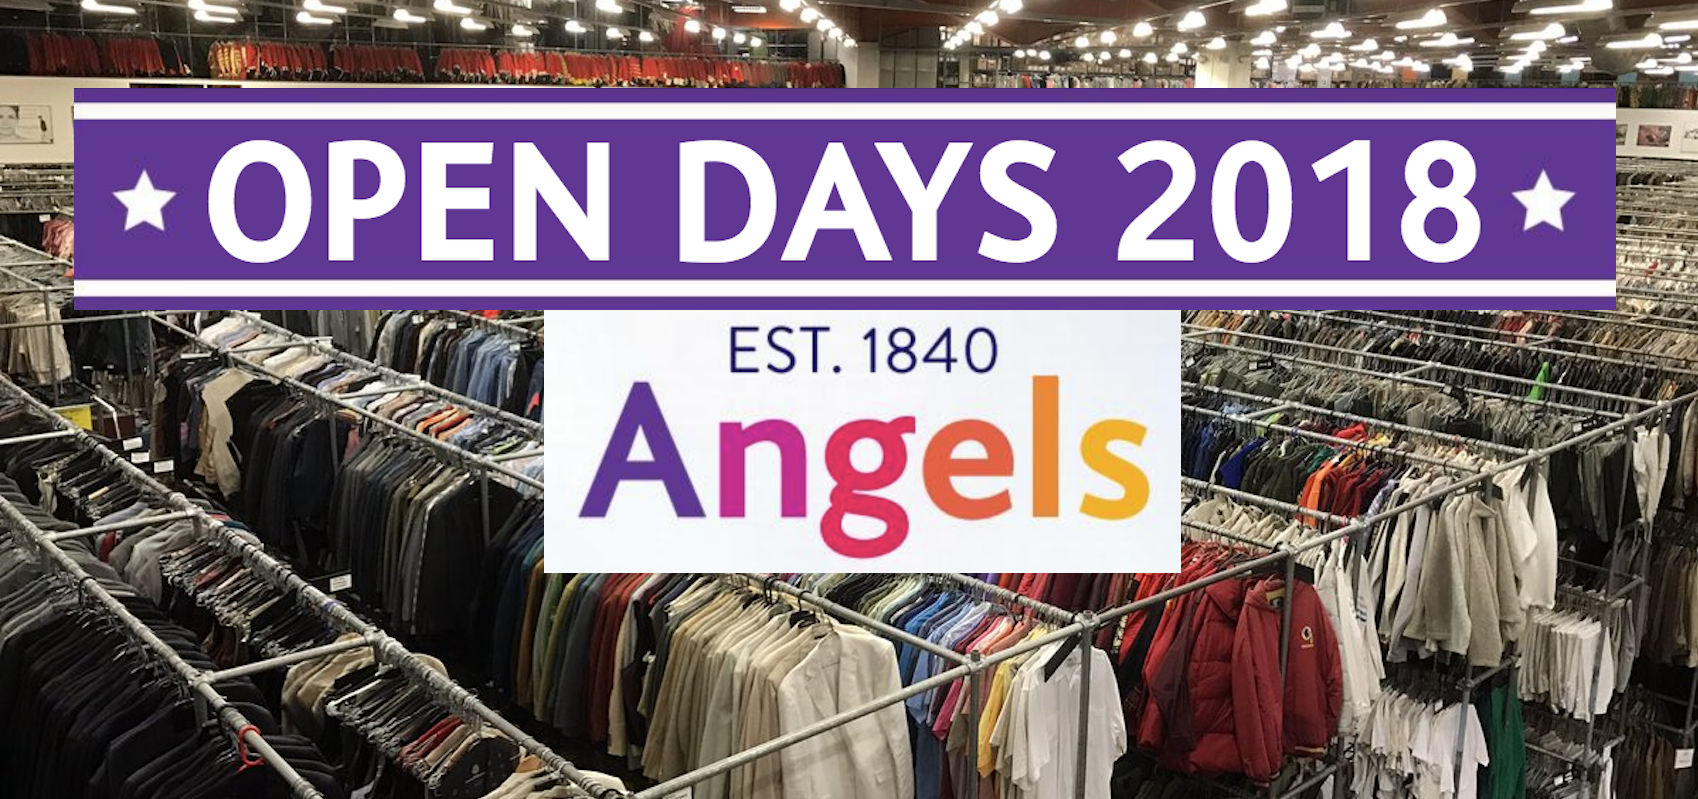 Angels Open Days 2018